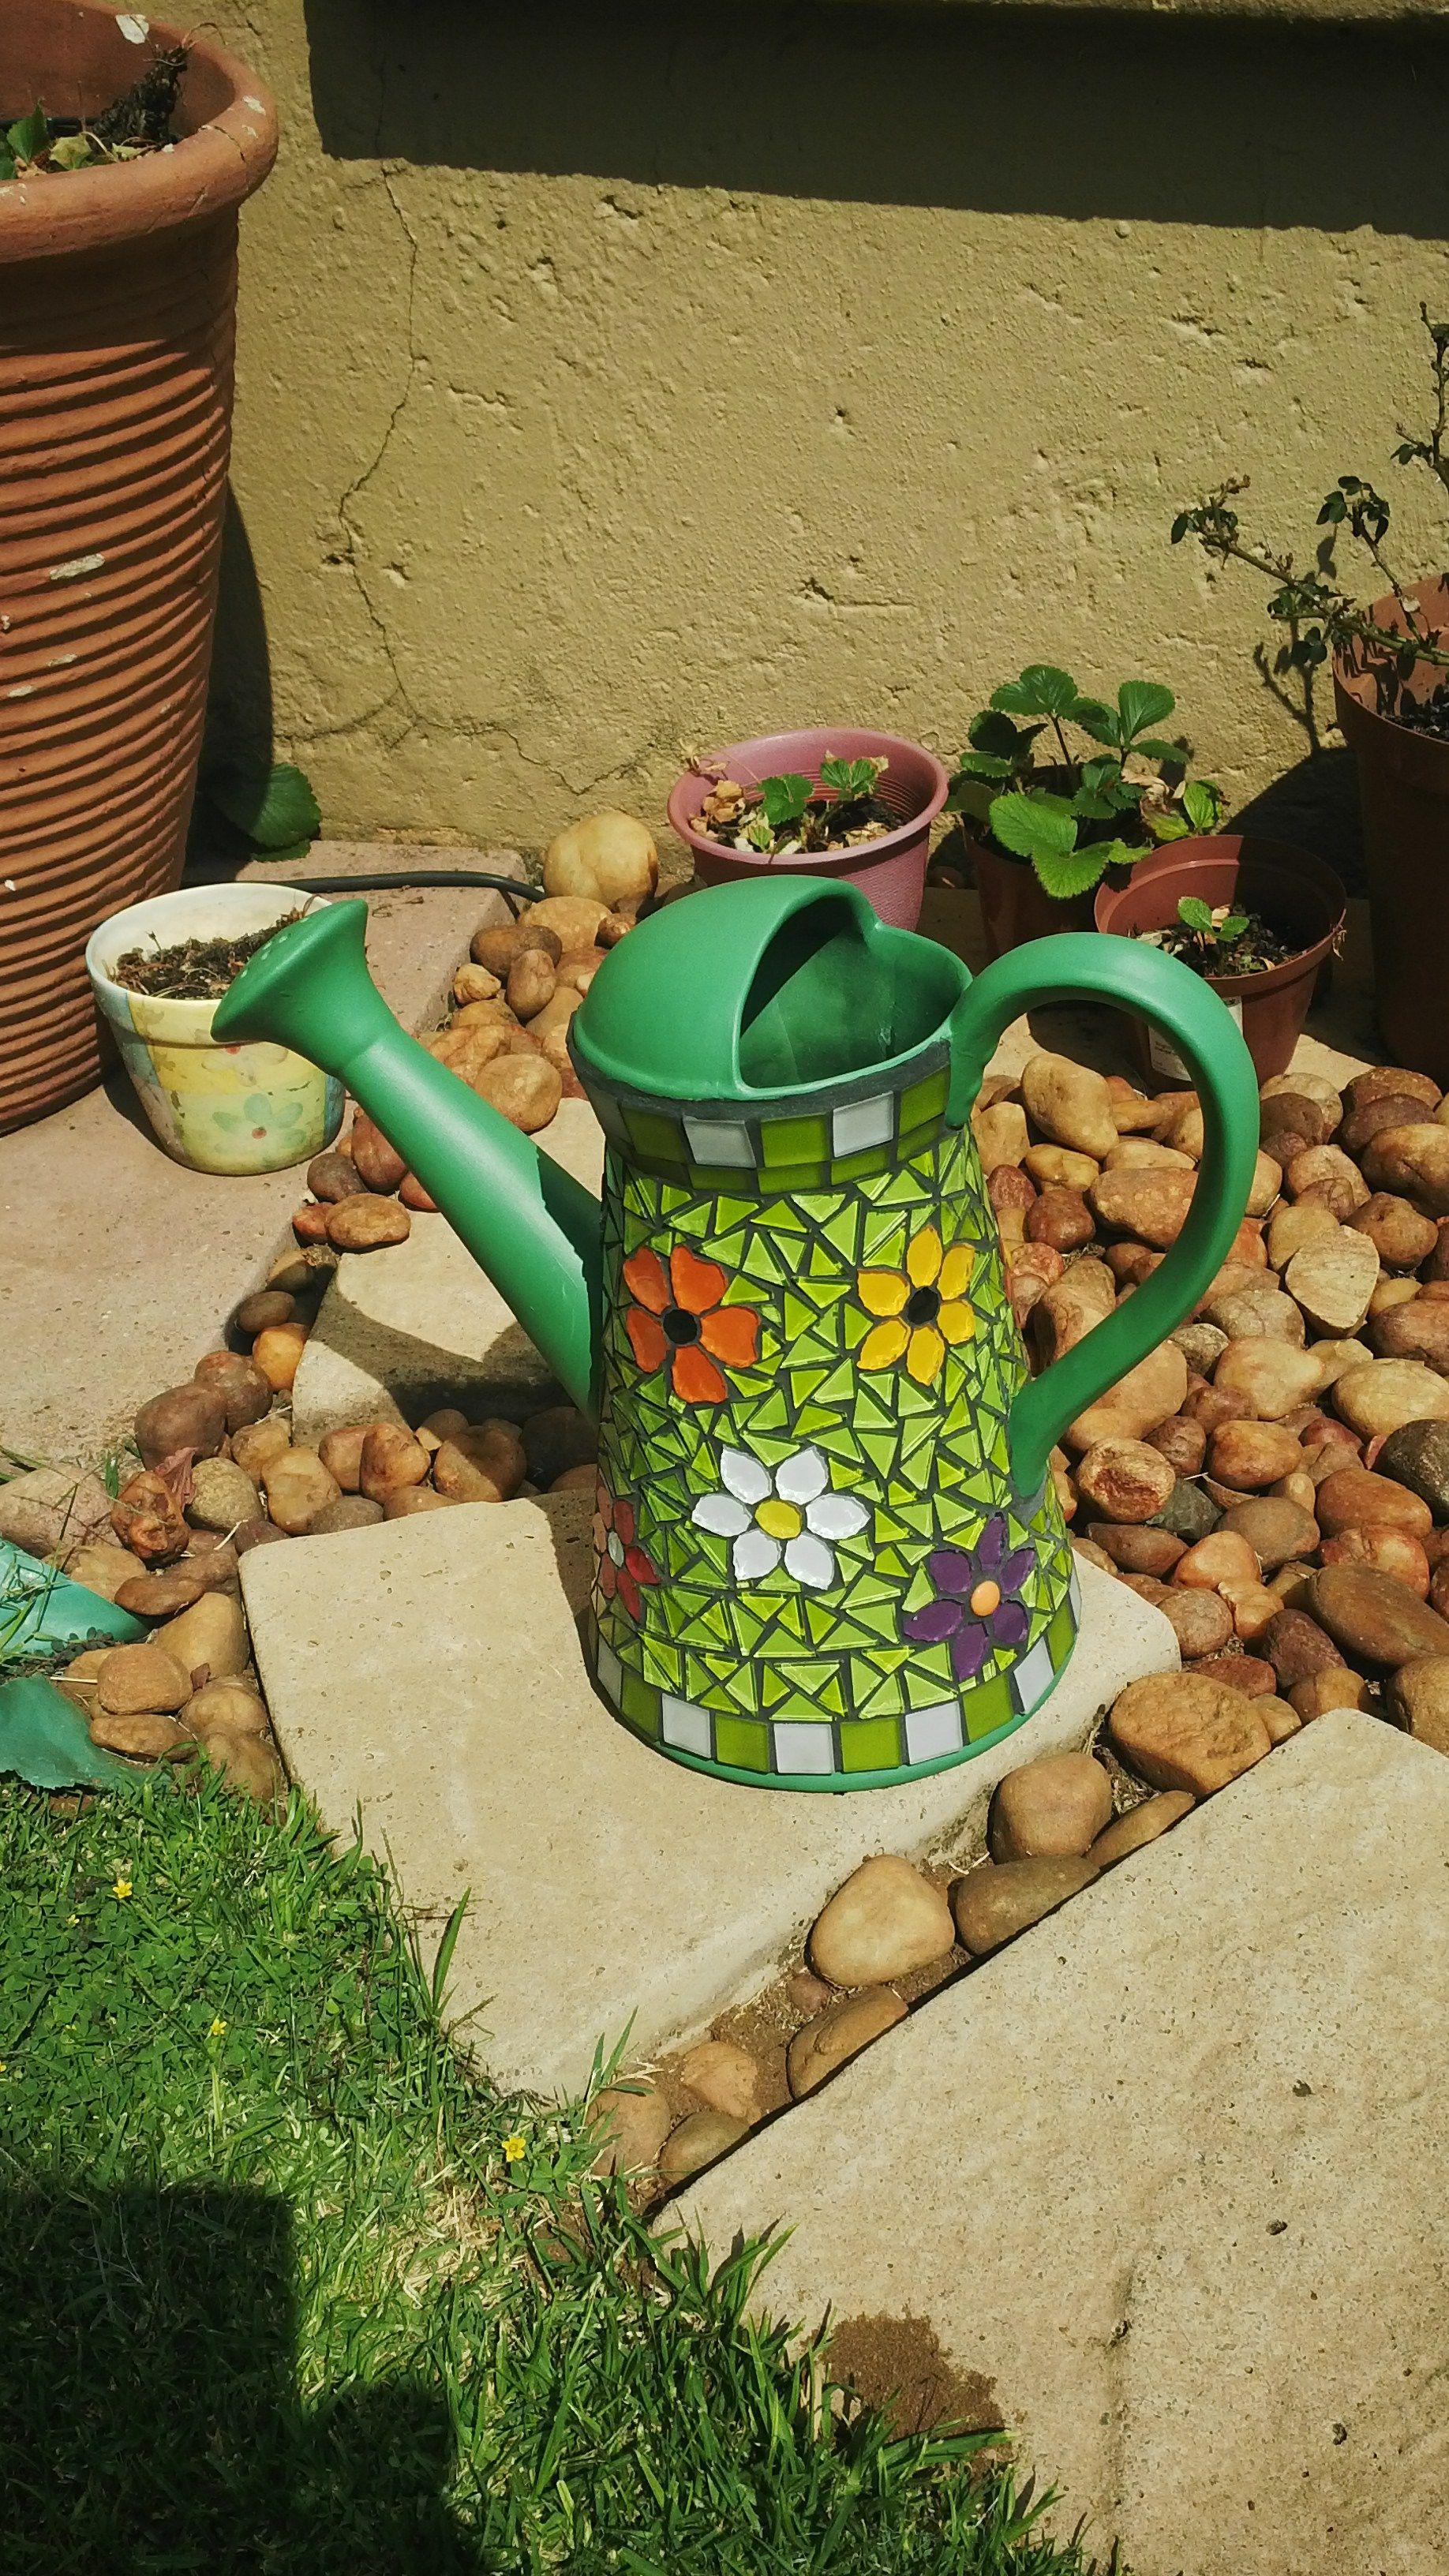 Attractive mosaic ideas for the garden ideas beautiful garden watering can mosaic garden pinteres workwithnaturefo